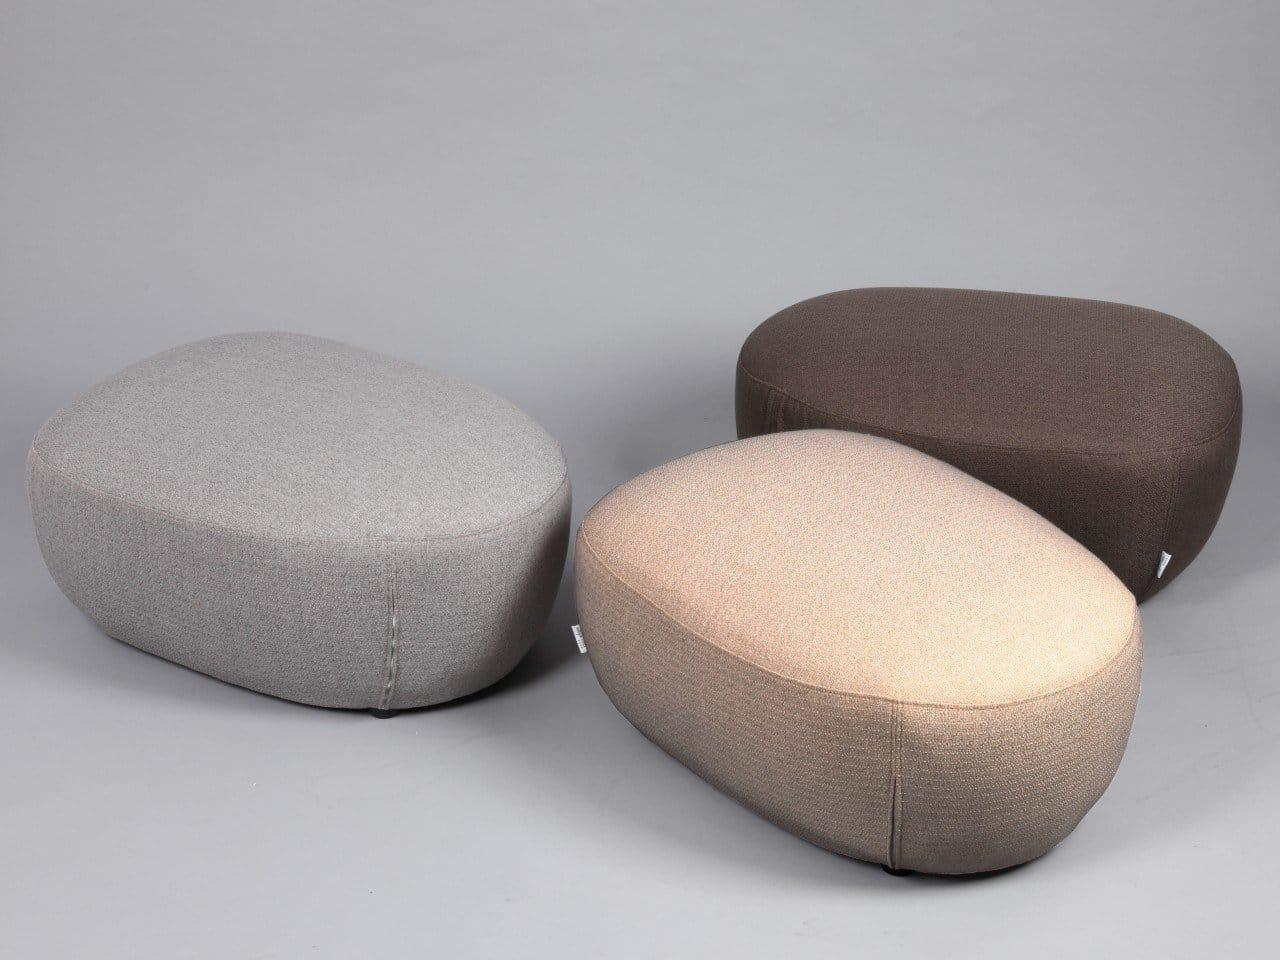 Pebble StoolOttoman Comfort Design The Chair amp Table